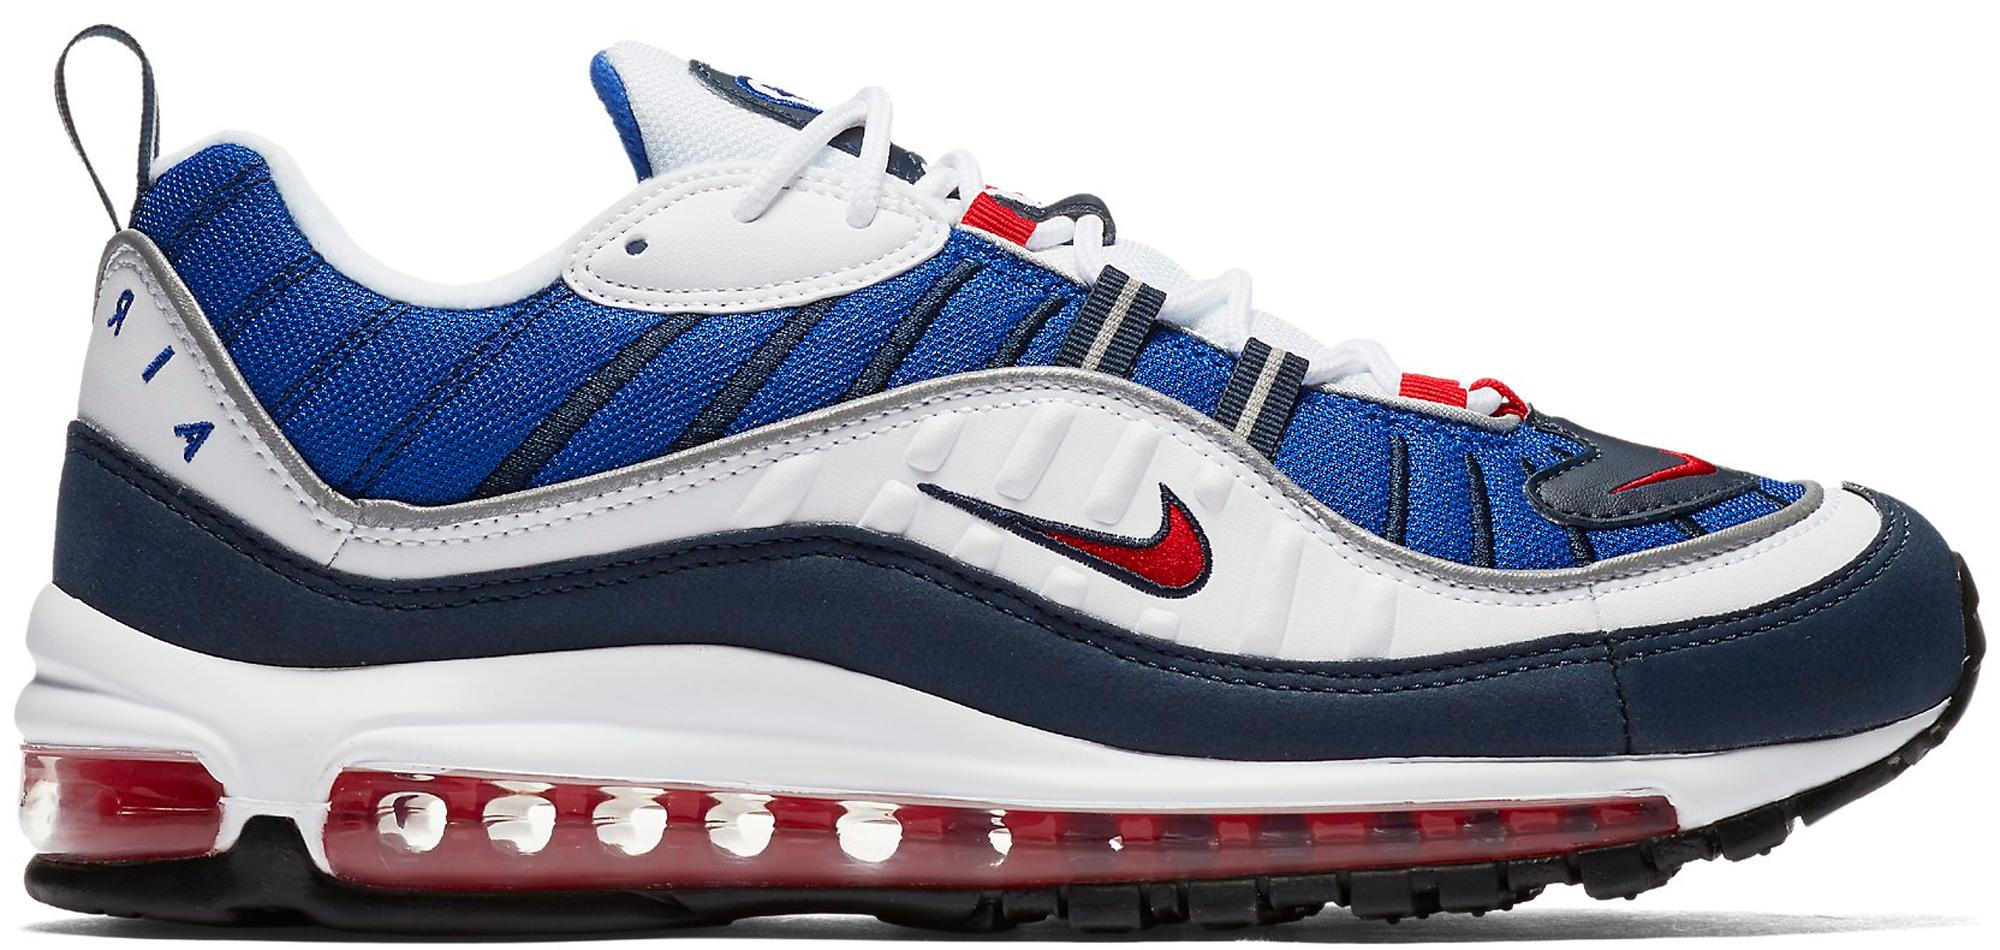 Hot Sale Nike Air Max 98 OG White Black Racer Blue Volt 640744 103 Mens Running Shoes Sneakers 640744 103